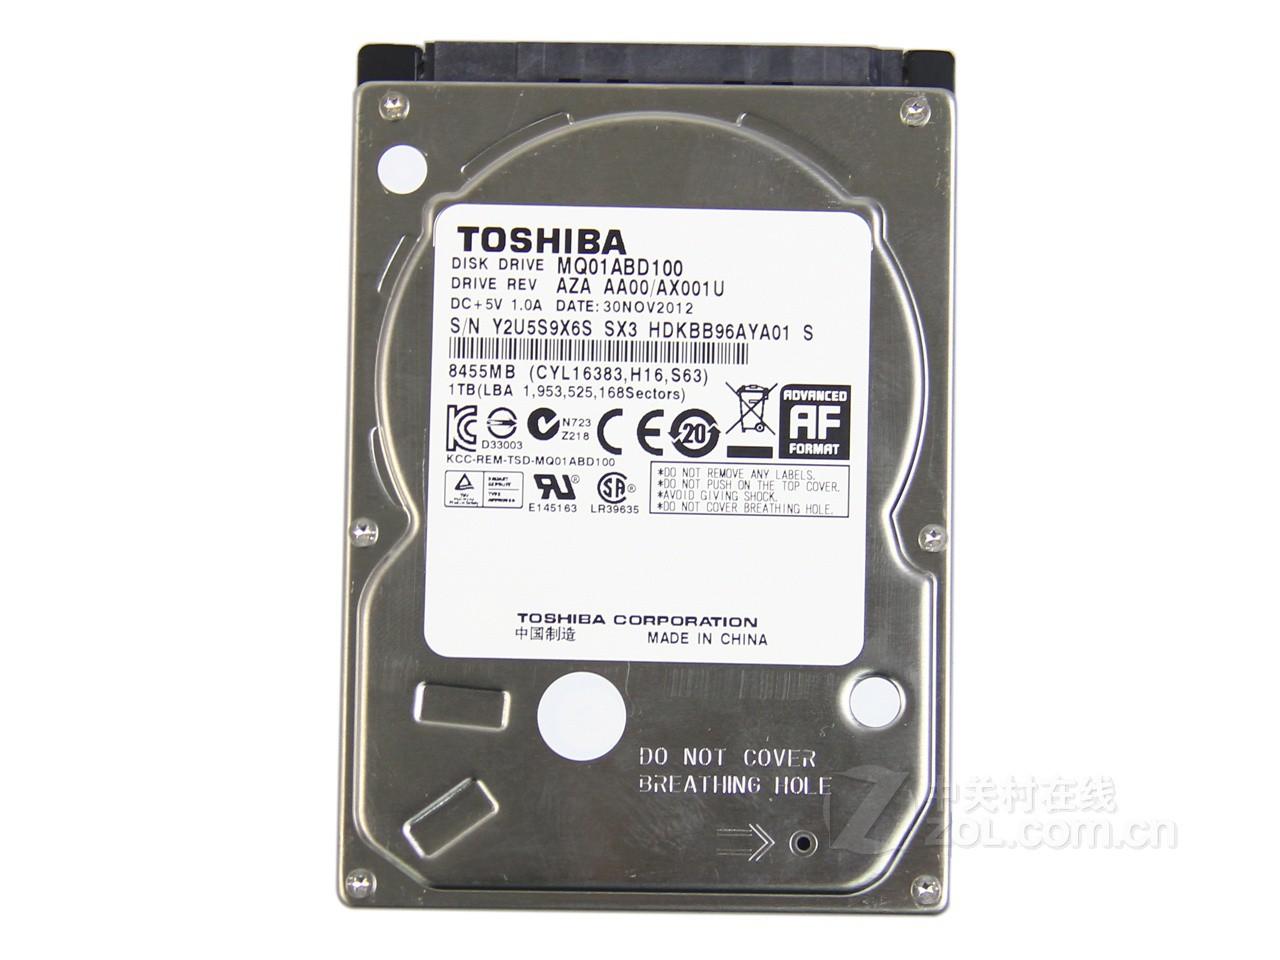 External Hard Drive 2tb Seagate Expansion Stbx2000401 25 Inch Usb 30 Hardisk Eksternal 1tb Toshiba 5400 Rpm Sata2 Sata Gb S